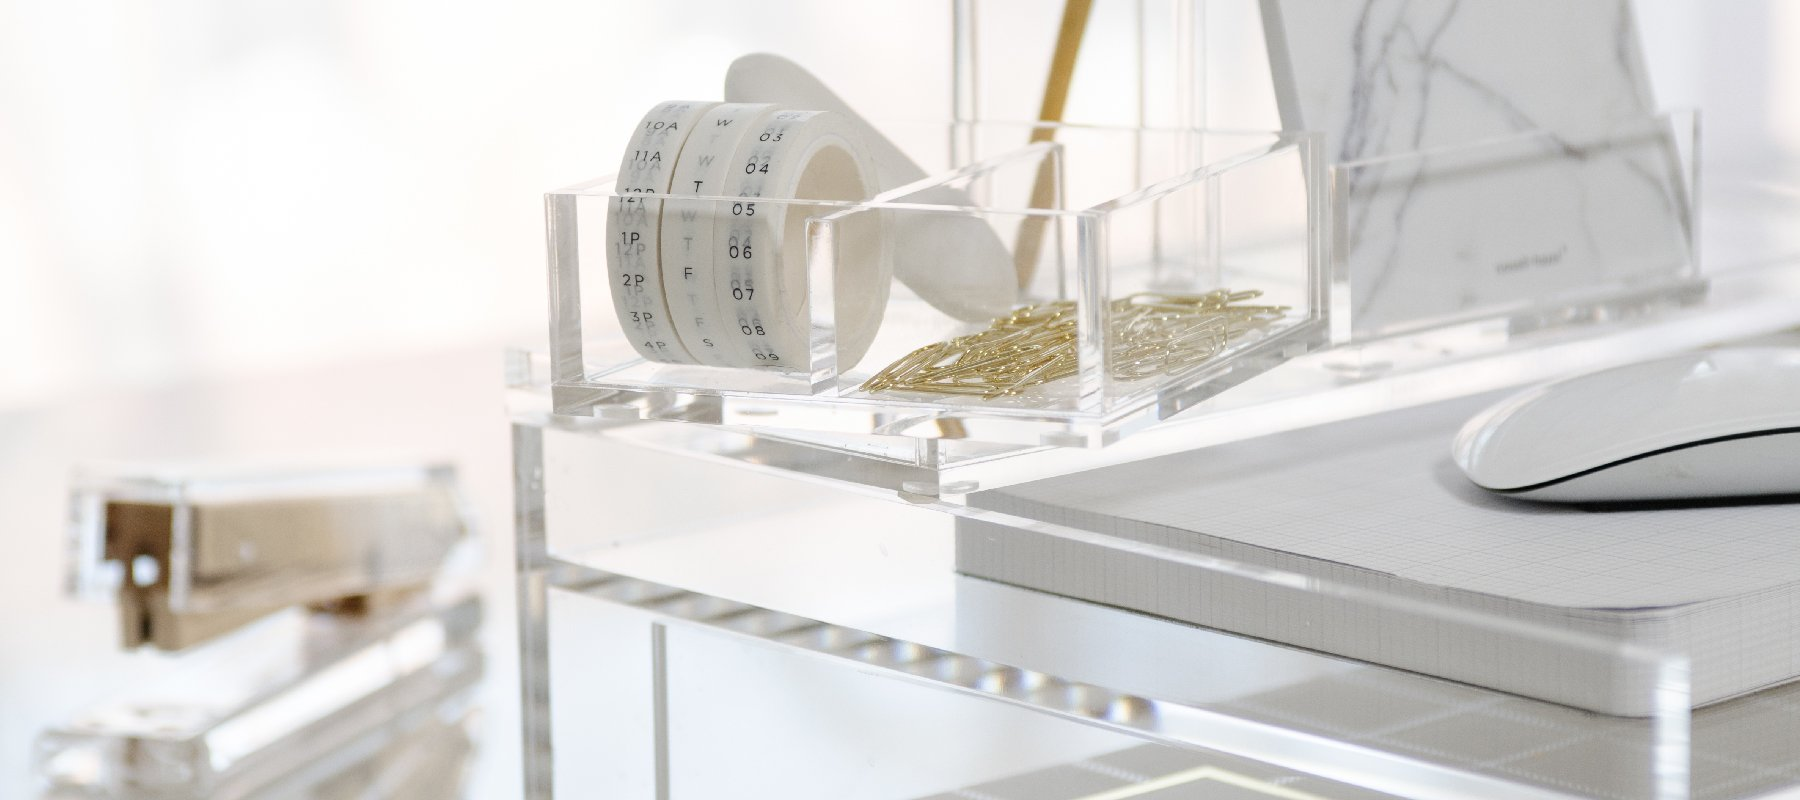 Acrylic Desk Essentials - russell+hazel